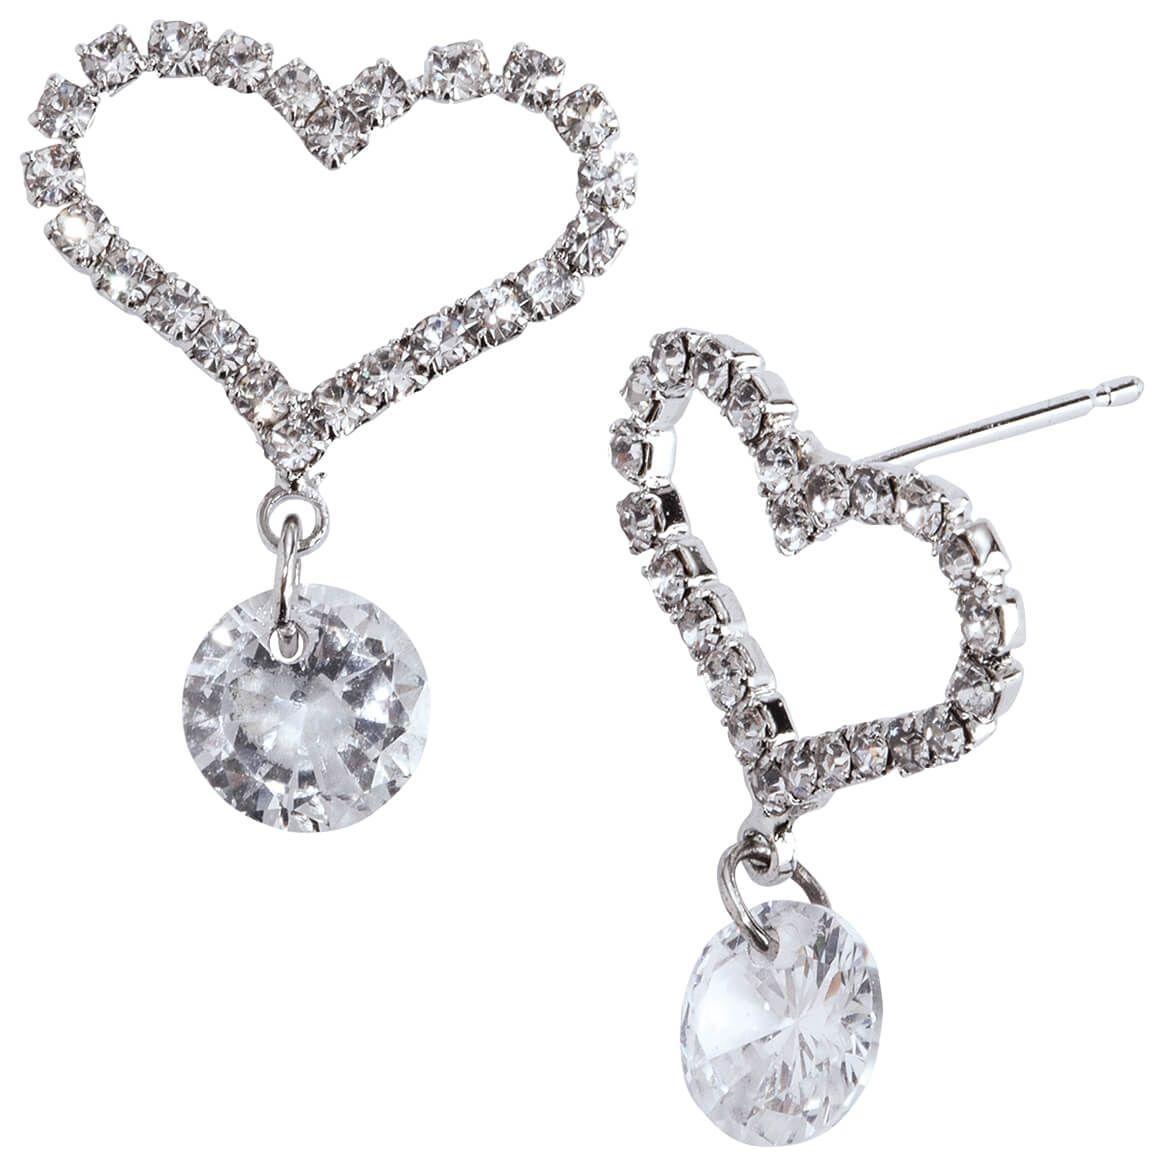 Heart Shaped CZ Earrings with Crystal Dangle-370356